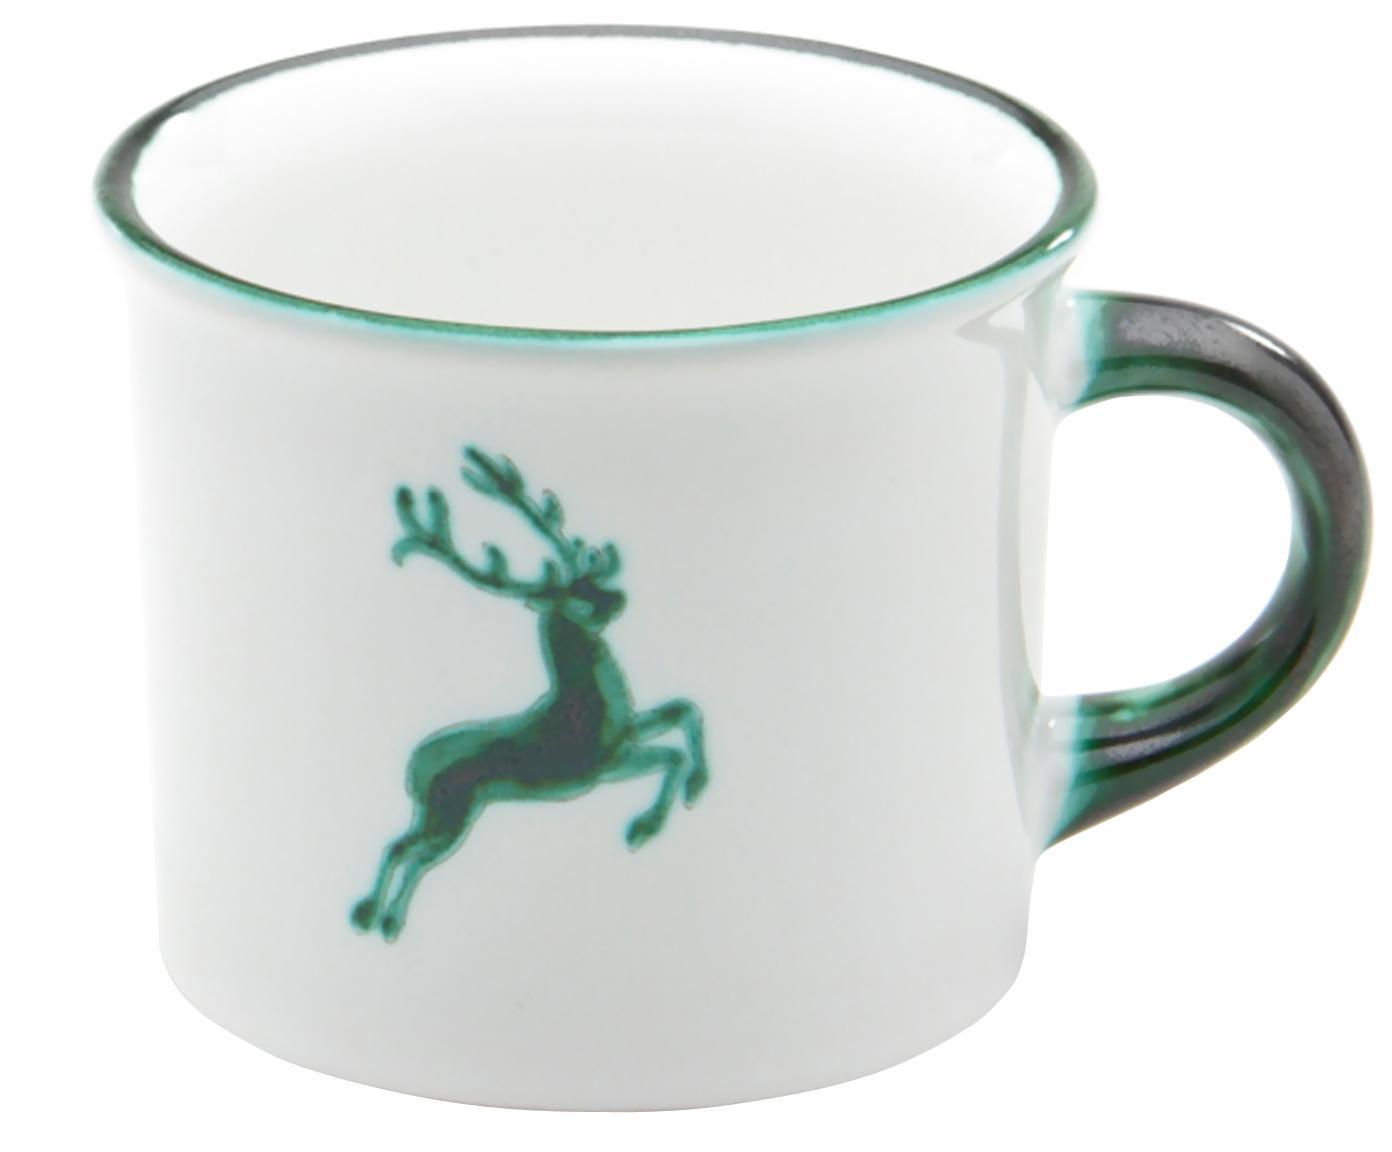 Koffiemok Groene Hert, Keramiek, Groen, wit, 240 ml